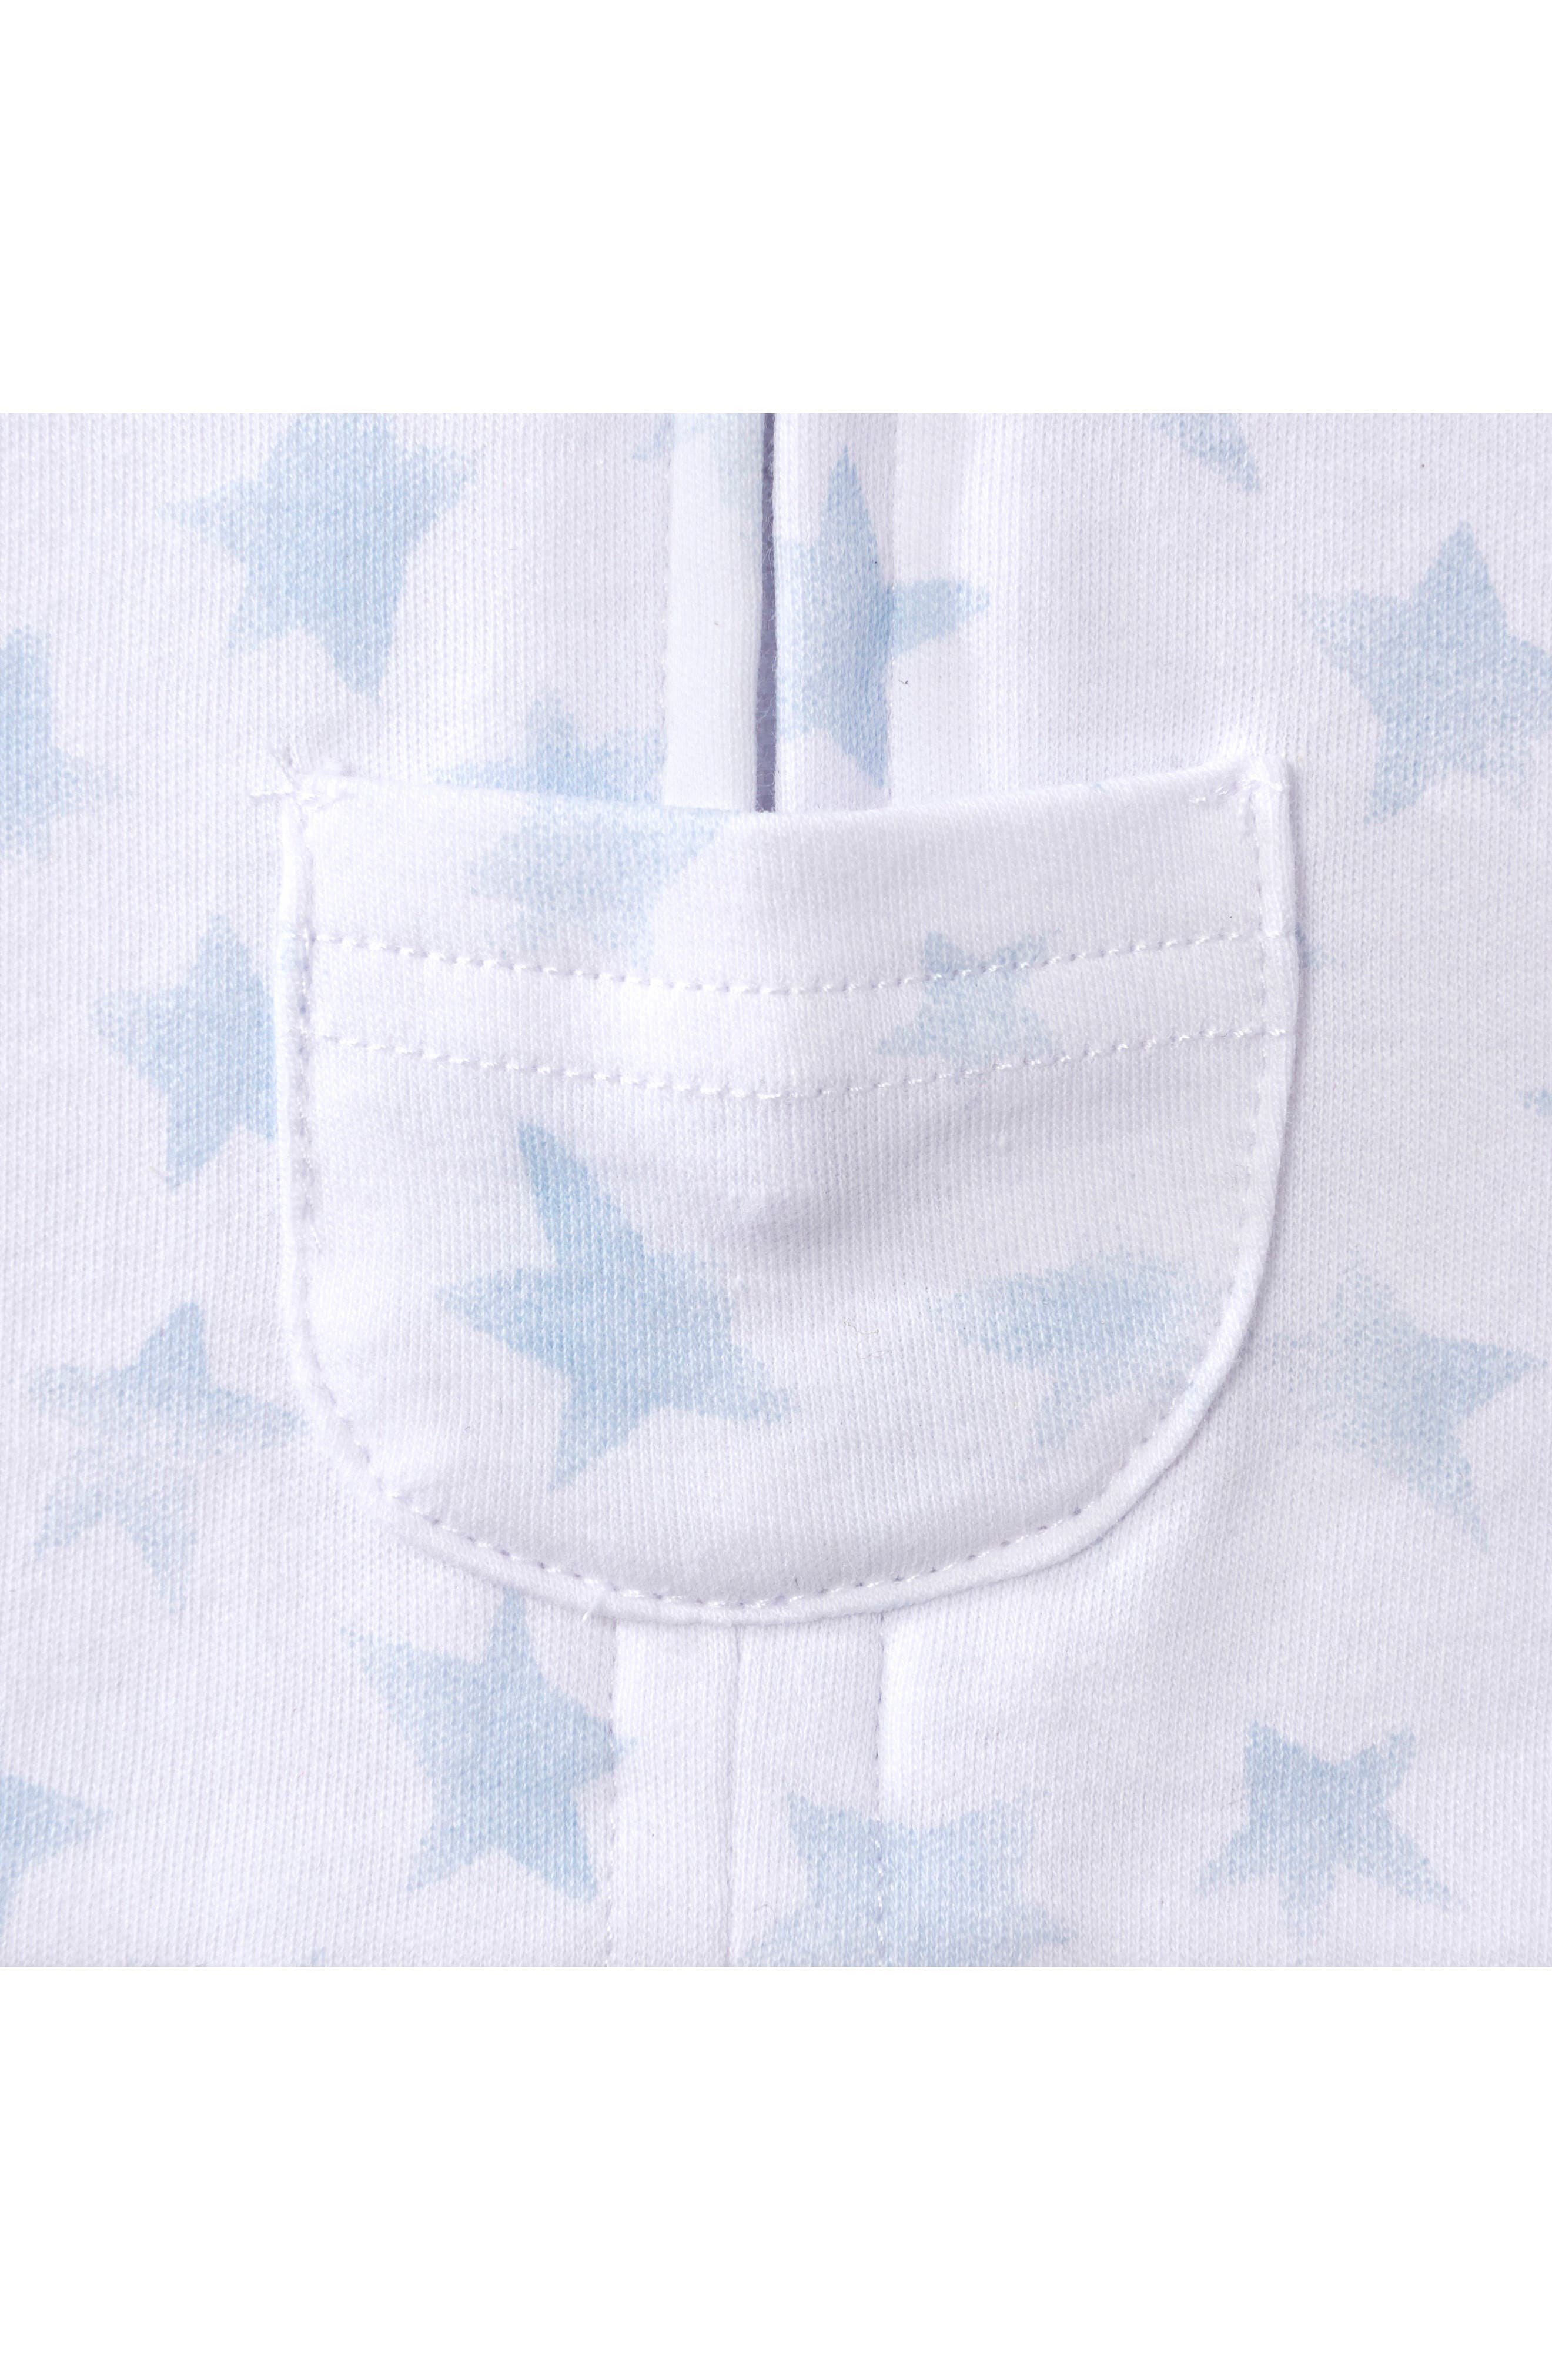 Platinum Series SleepSack<sup>™</sup> Swaddle,                             Alternate thumbnail 4, color,                             Pale Blue Twinkle